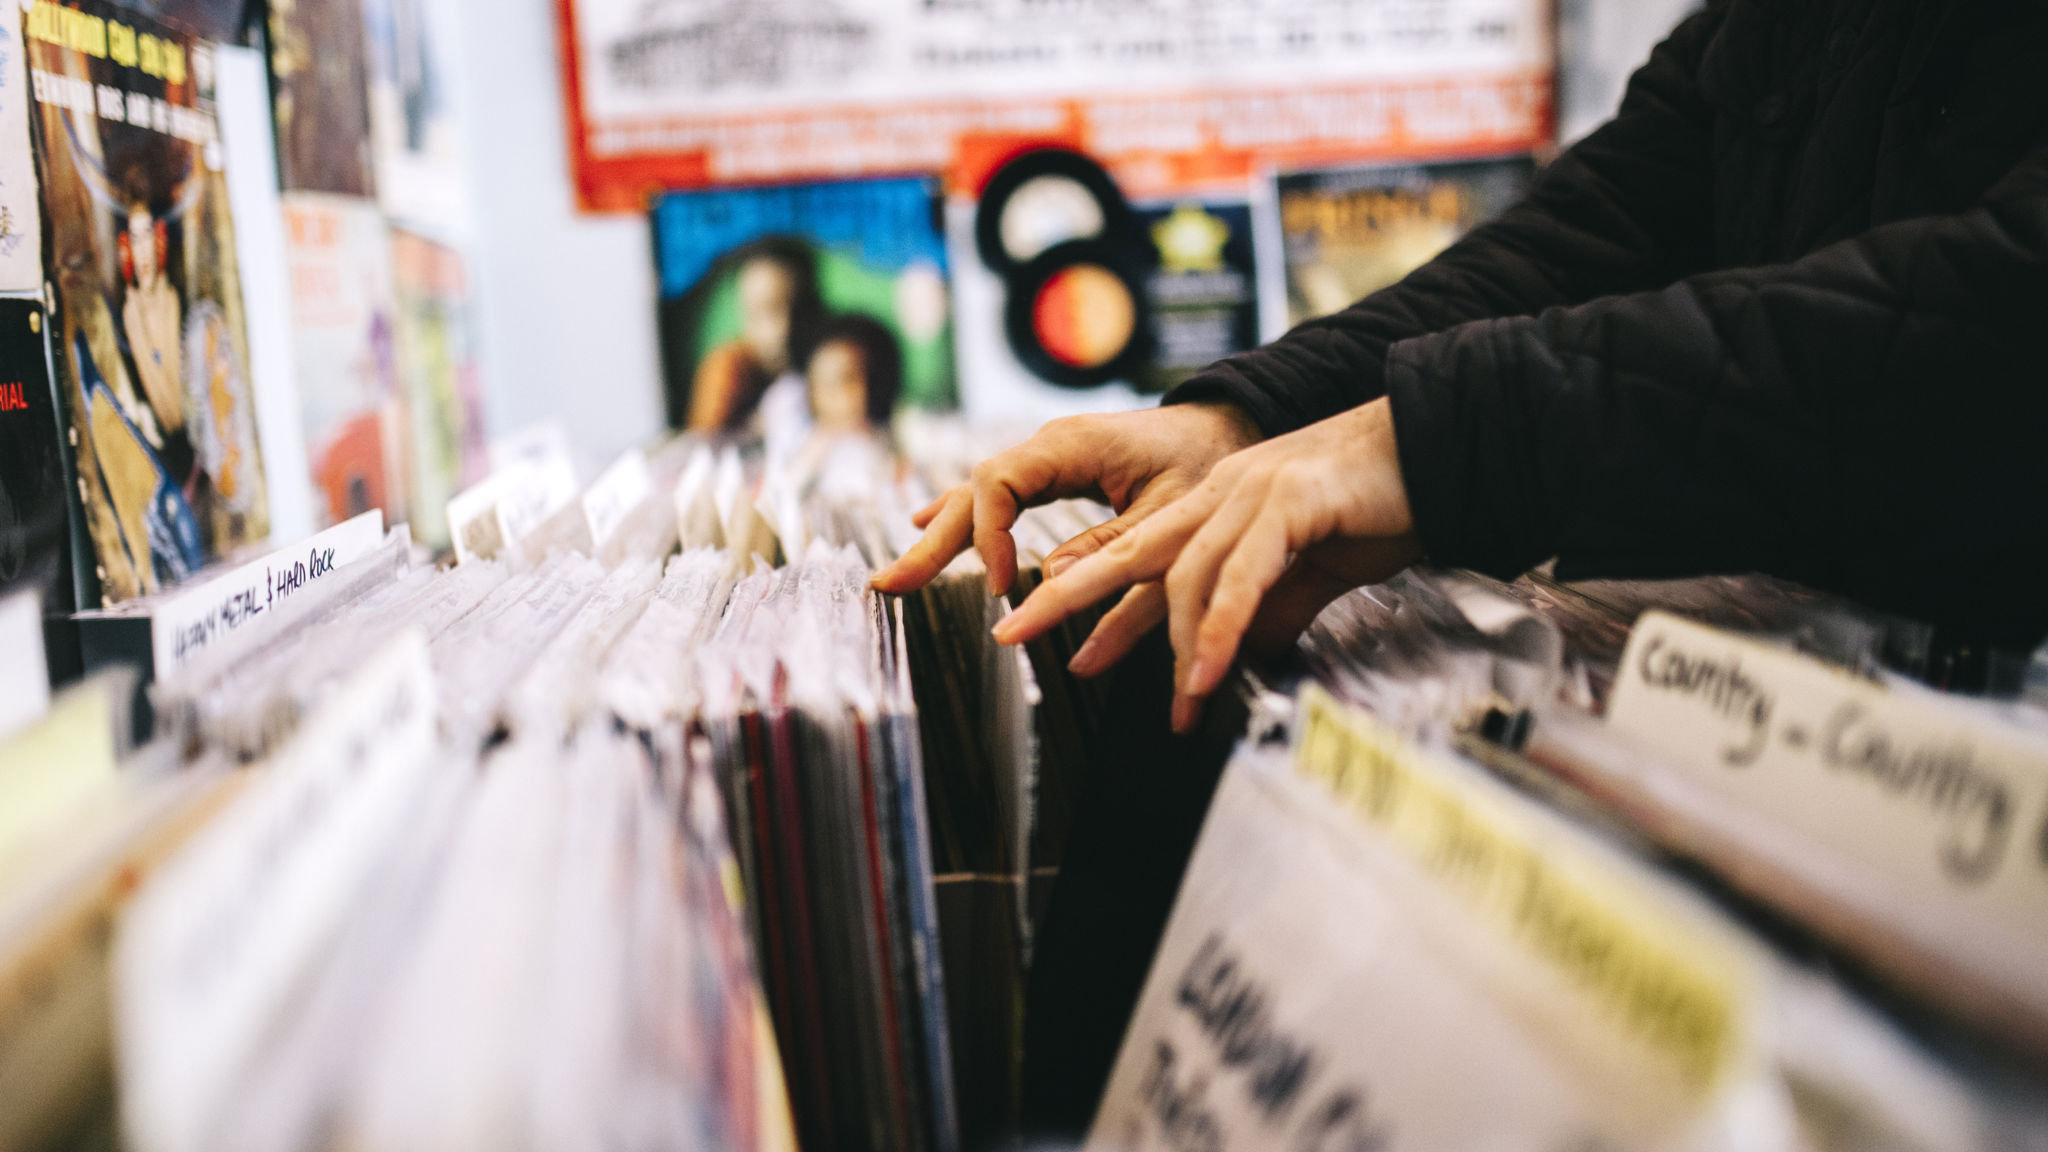 Counterfeit crackdown as vinyl revival rekindles bootlegging